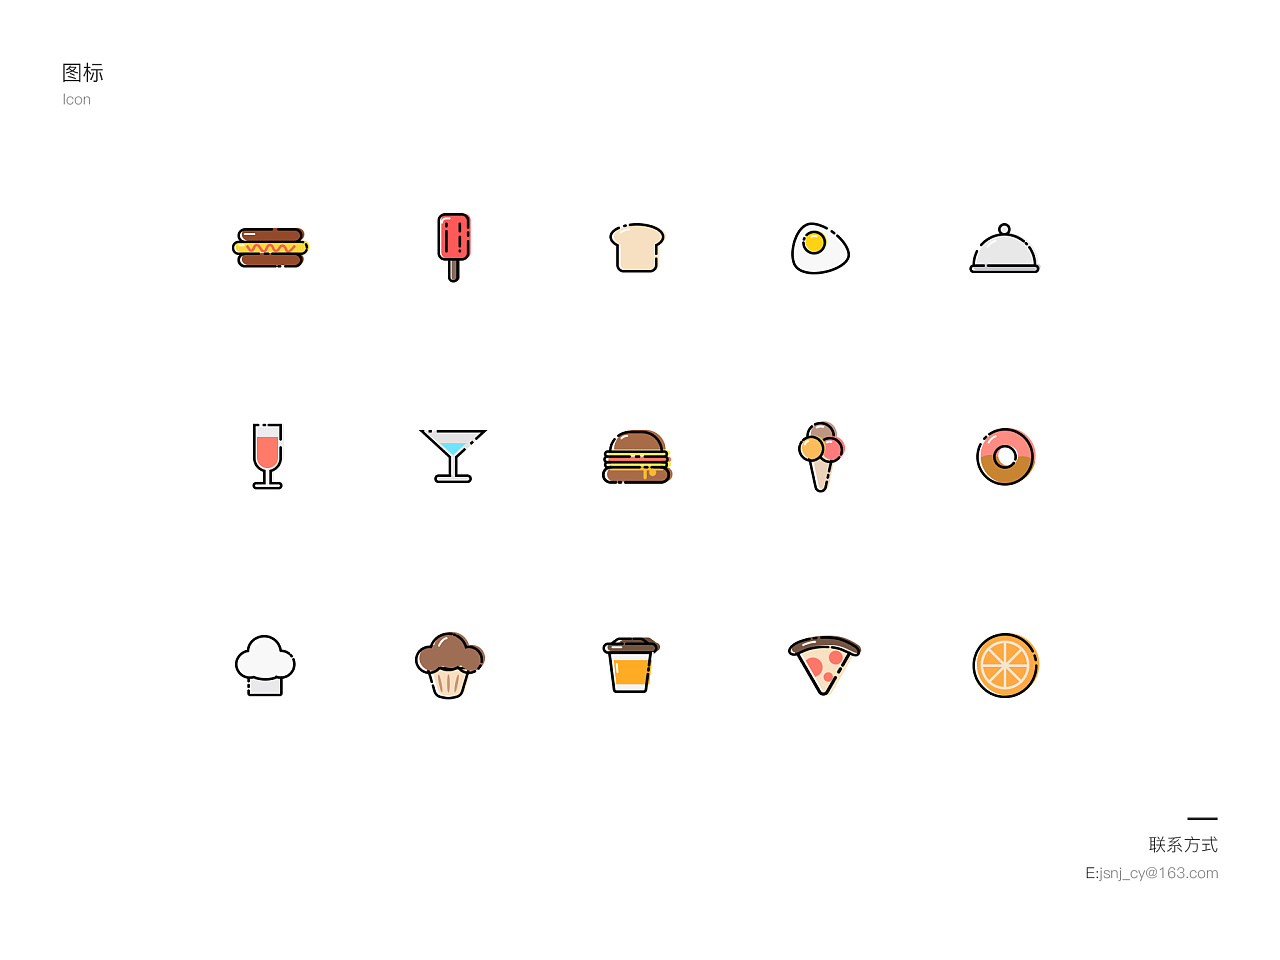 icon 填色描边风格甜品小icon绘制图片